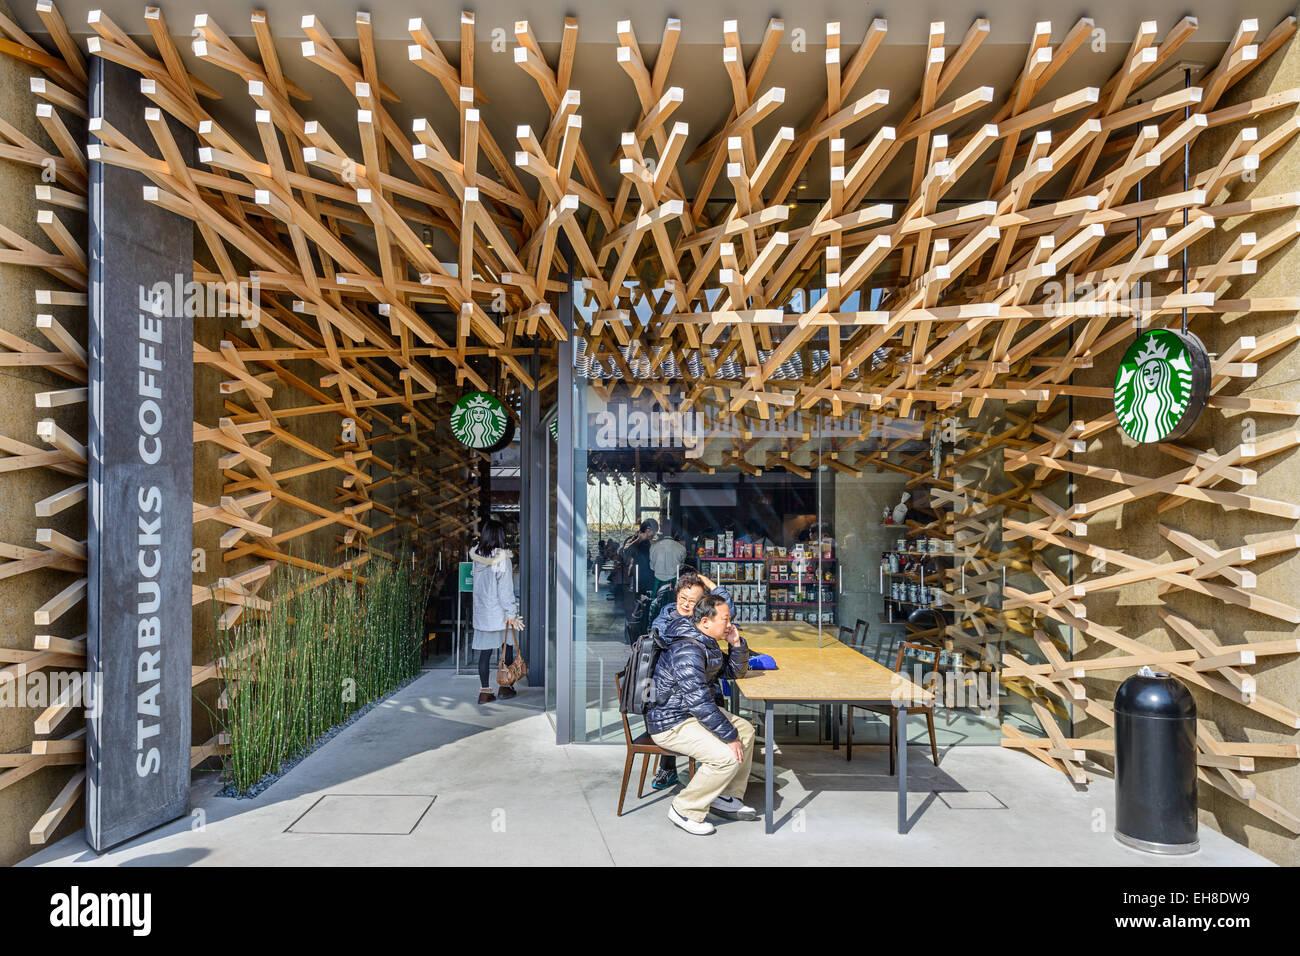 Die einzigartige Starbucks Dazaifu, Japan. Stockbild